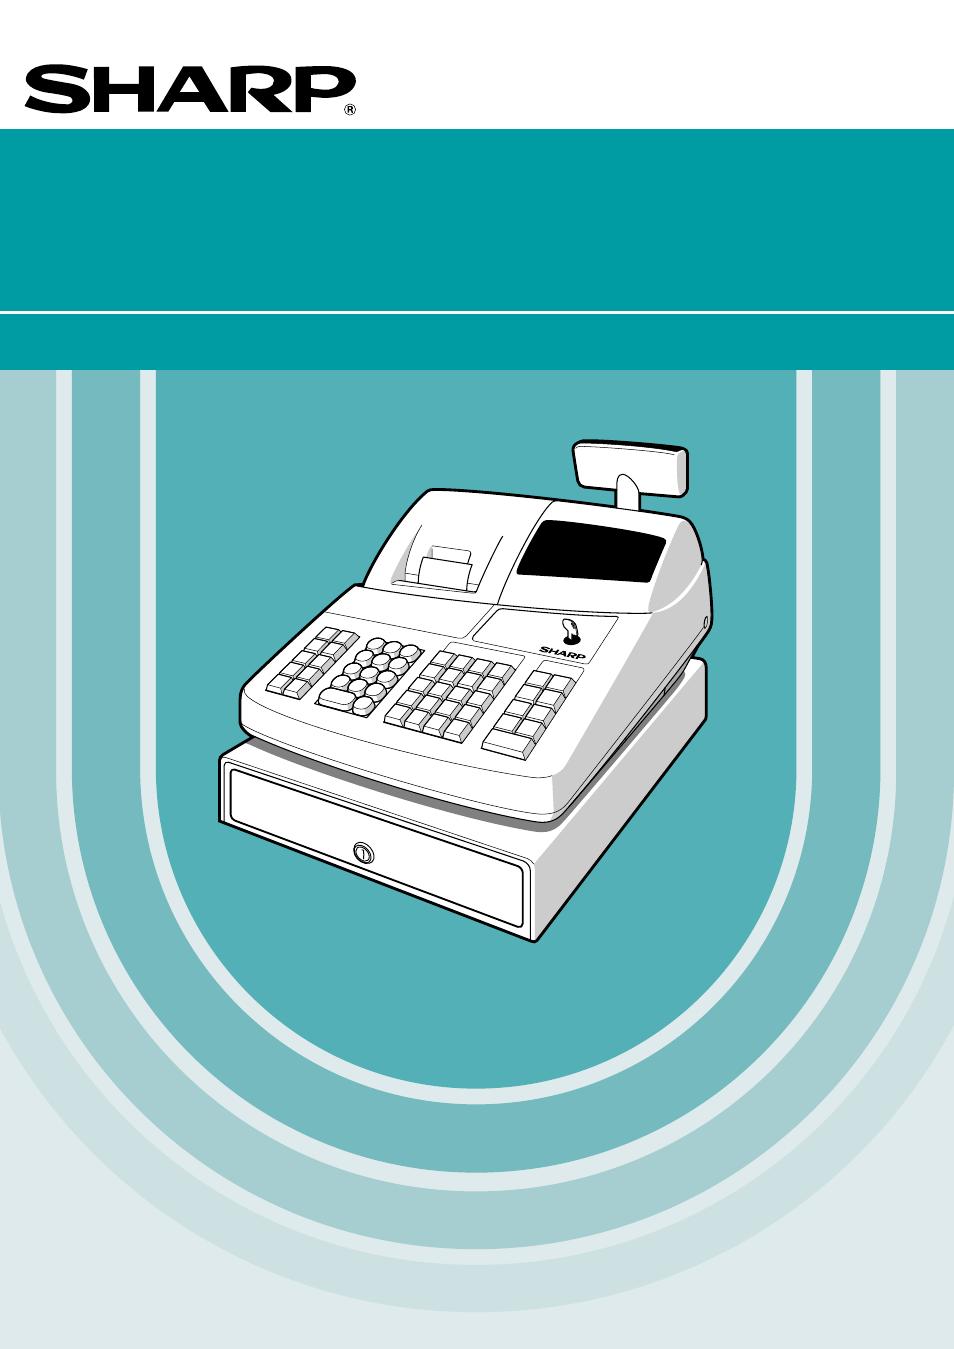 sharp electronic cash register xe a201 user manual 105 pages rh manualsdir com Sharp Electronic Cash Register Help Programming Sharp Cash Register